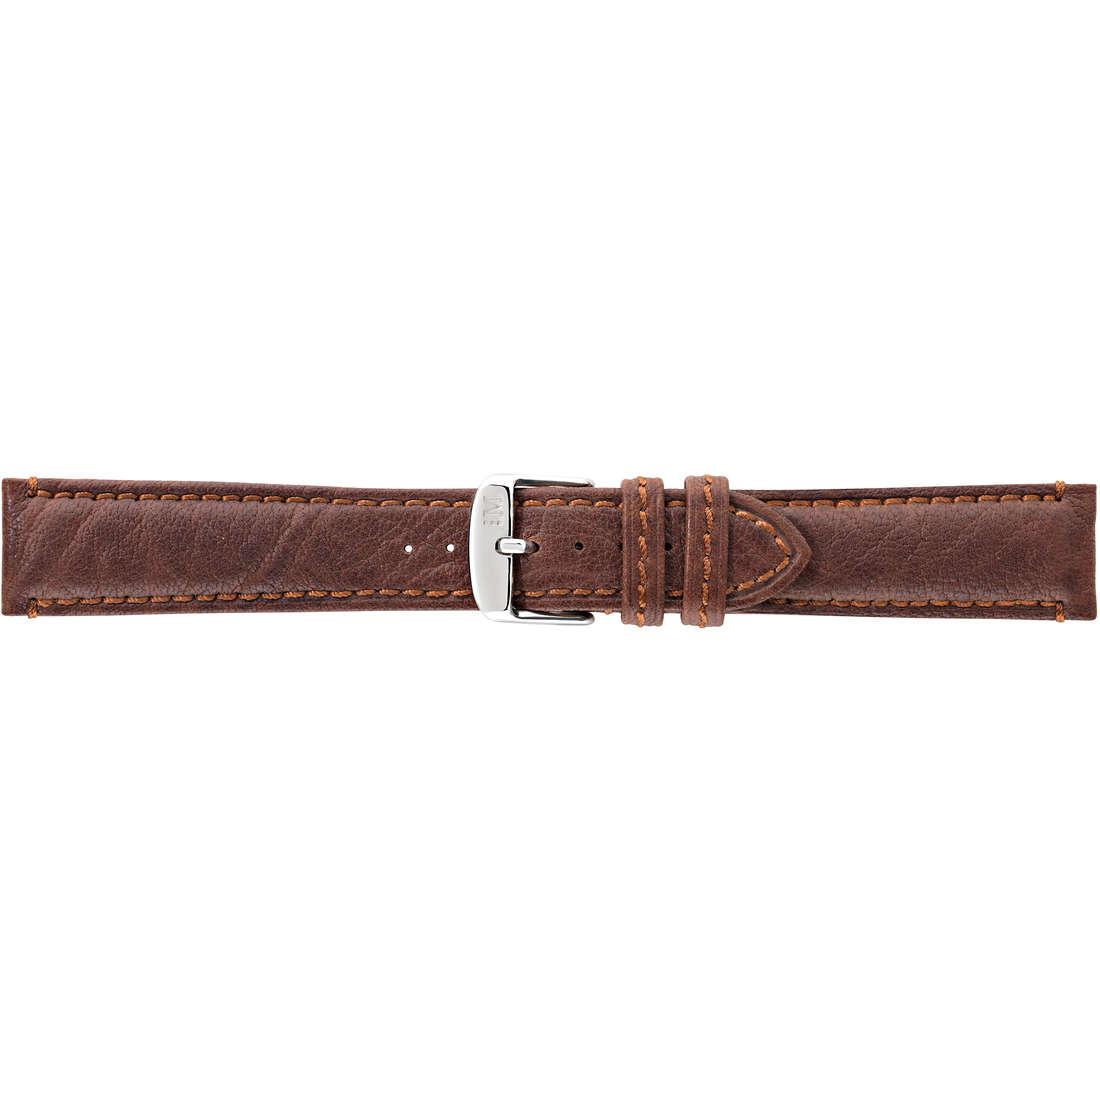 watch watch bands watch straps man Morellato Manufatti A01U3221767040CR20